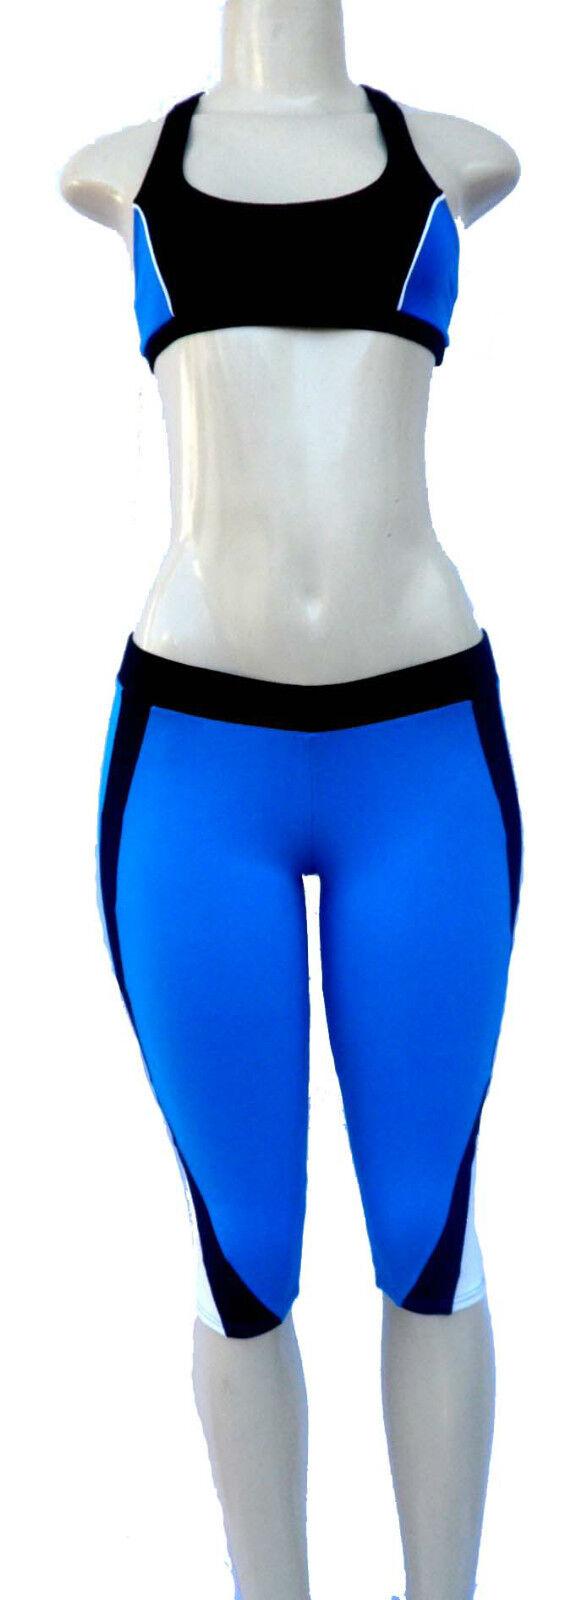 Brazilian Fitness Supplex Bra & Capri Outfit